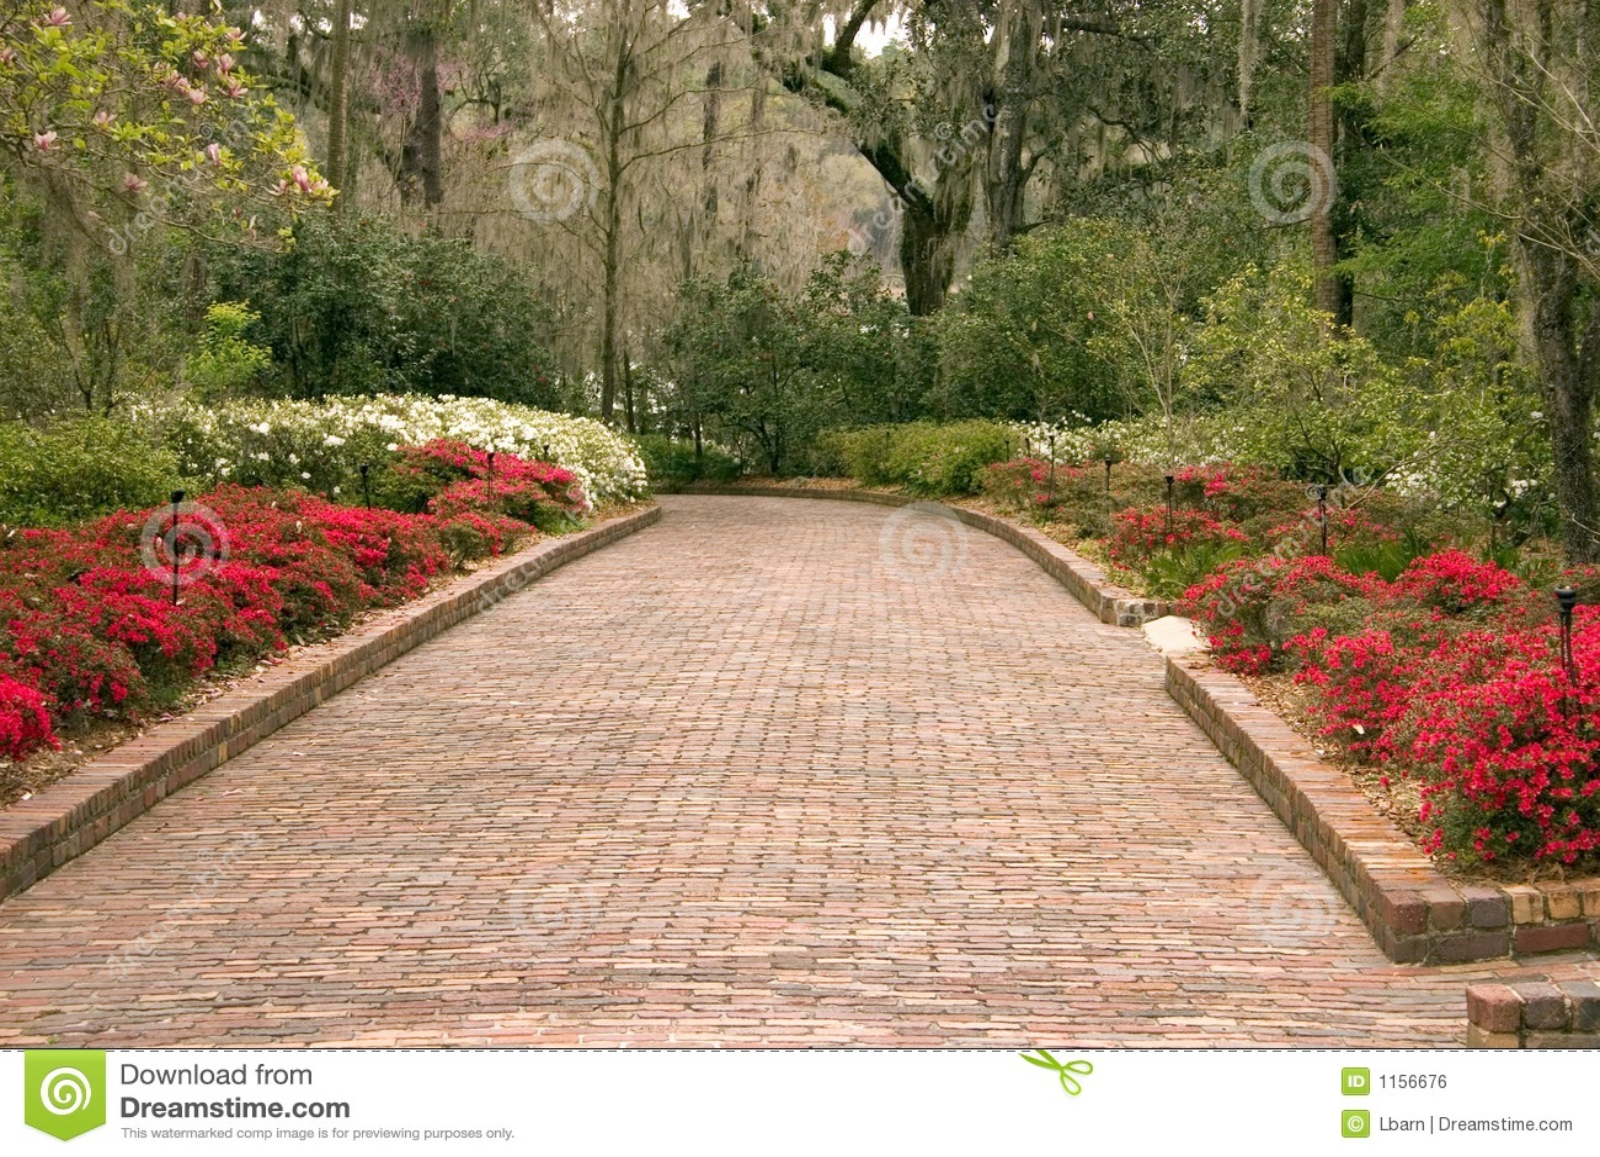 Wide Garden Walkway Royalty Free Stock Image - Image: 1156676